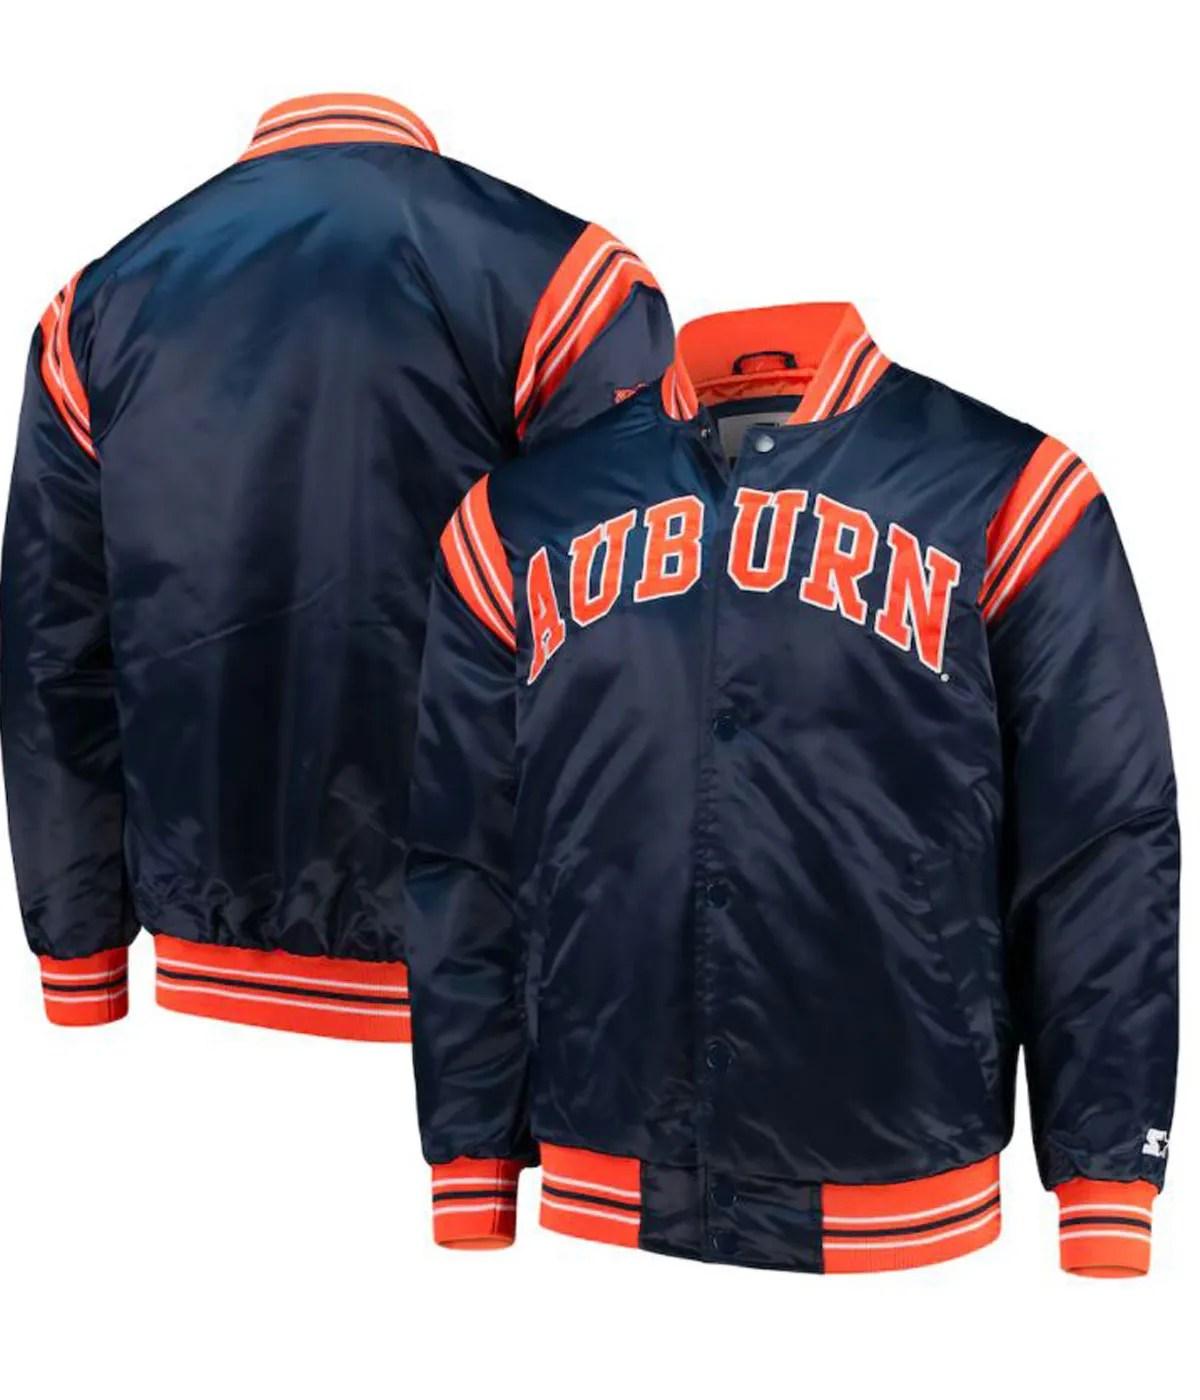 auburn-tigers-the-enforcer-blue-satin-jacket